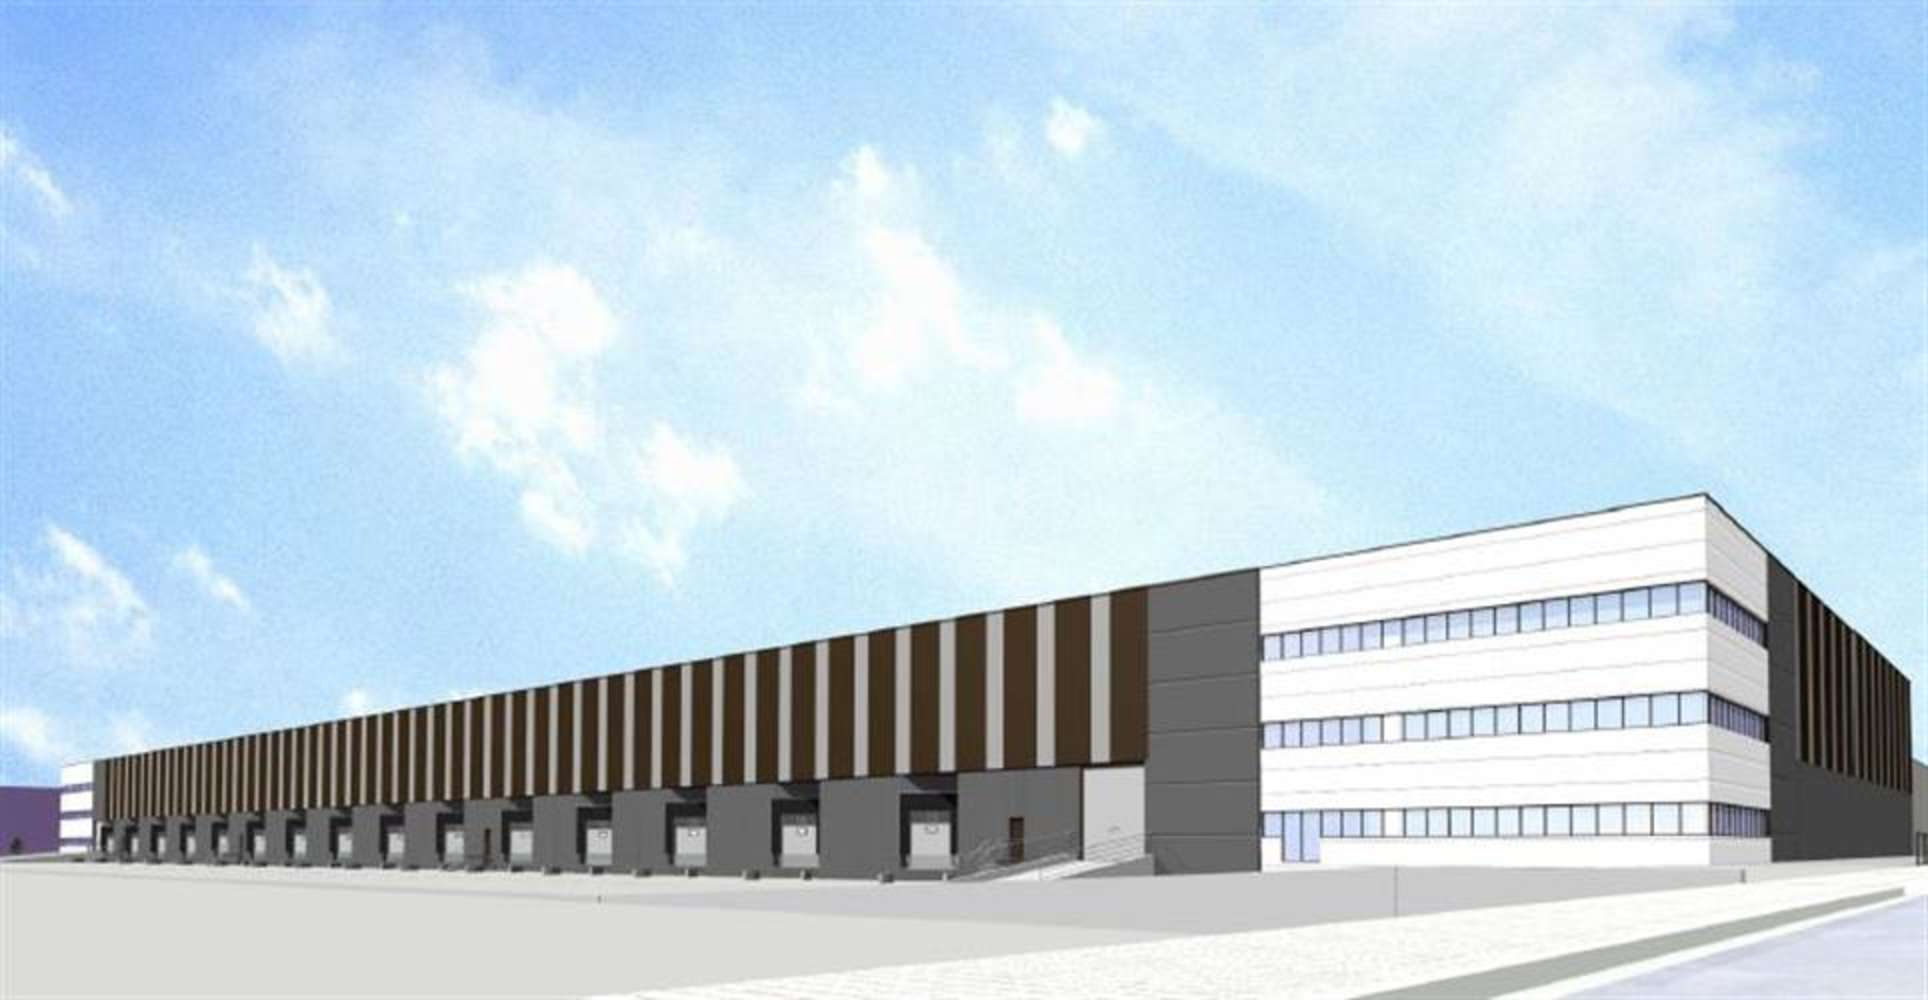 Naves industriales y logísticas Castellbisbal, 08755 - Nave Logistica - B0400 - AREA LOGISTICA LLOBREGAT - 11527